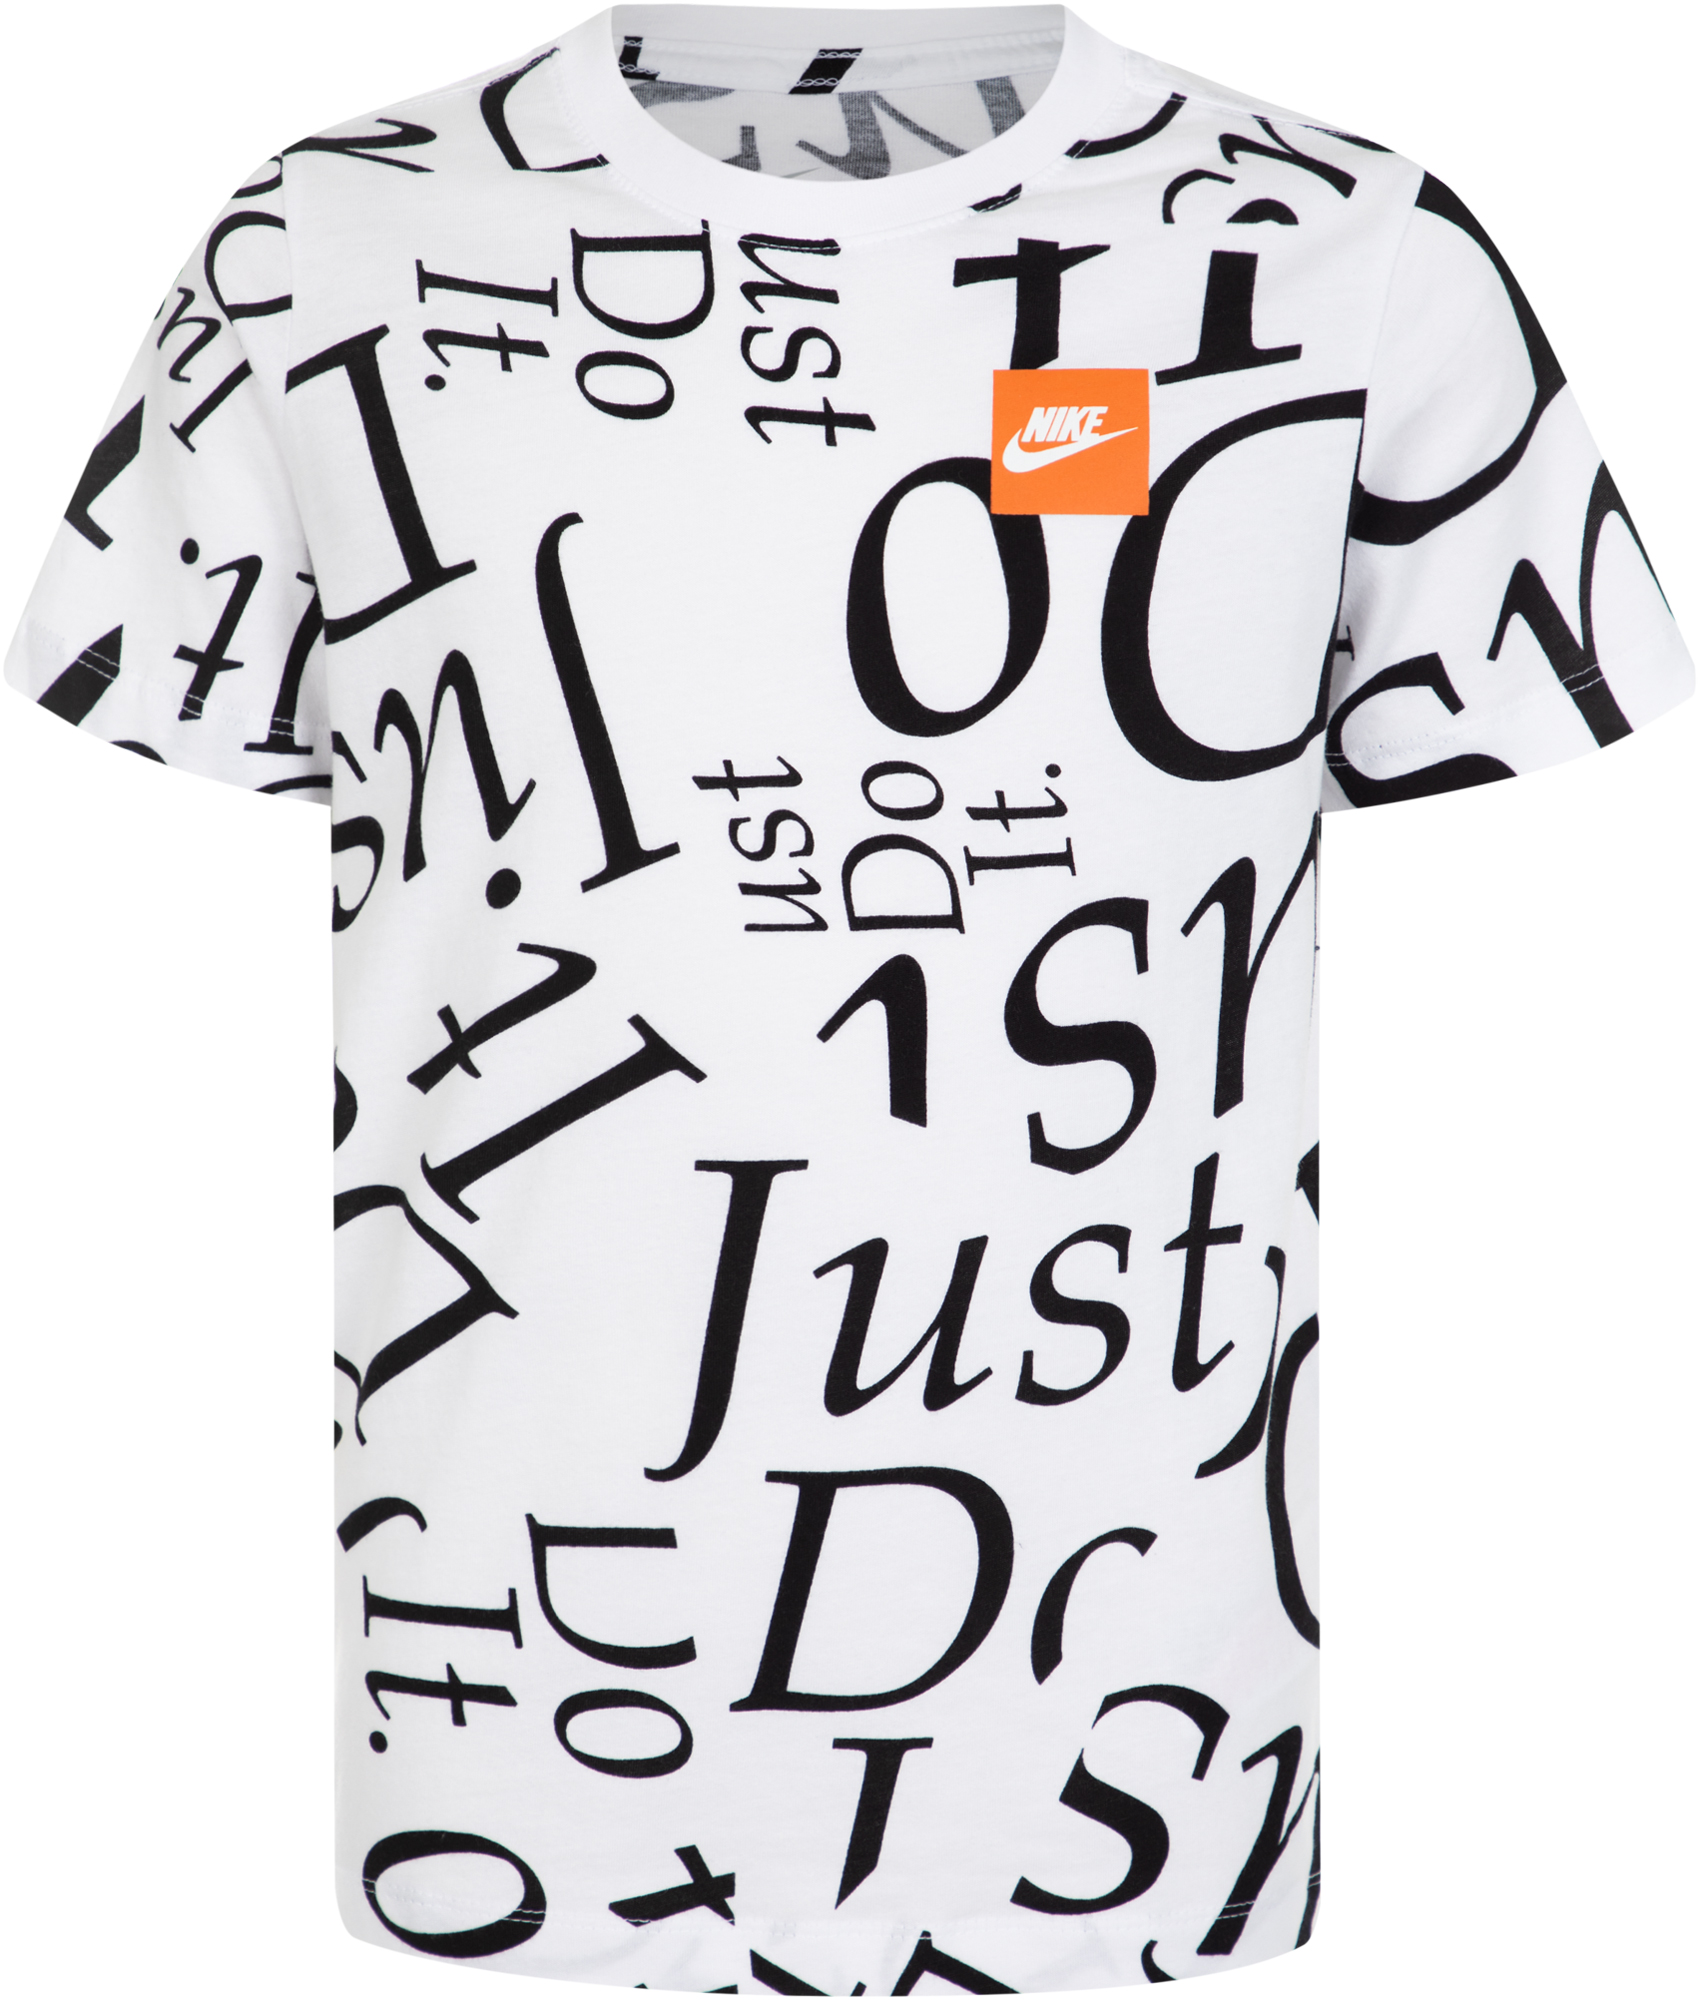 Nike Футболка для мальчиков Nike Sportswear, размер 137-147 волкова н новый год в лесу